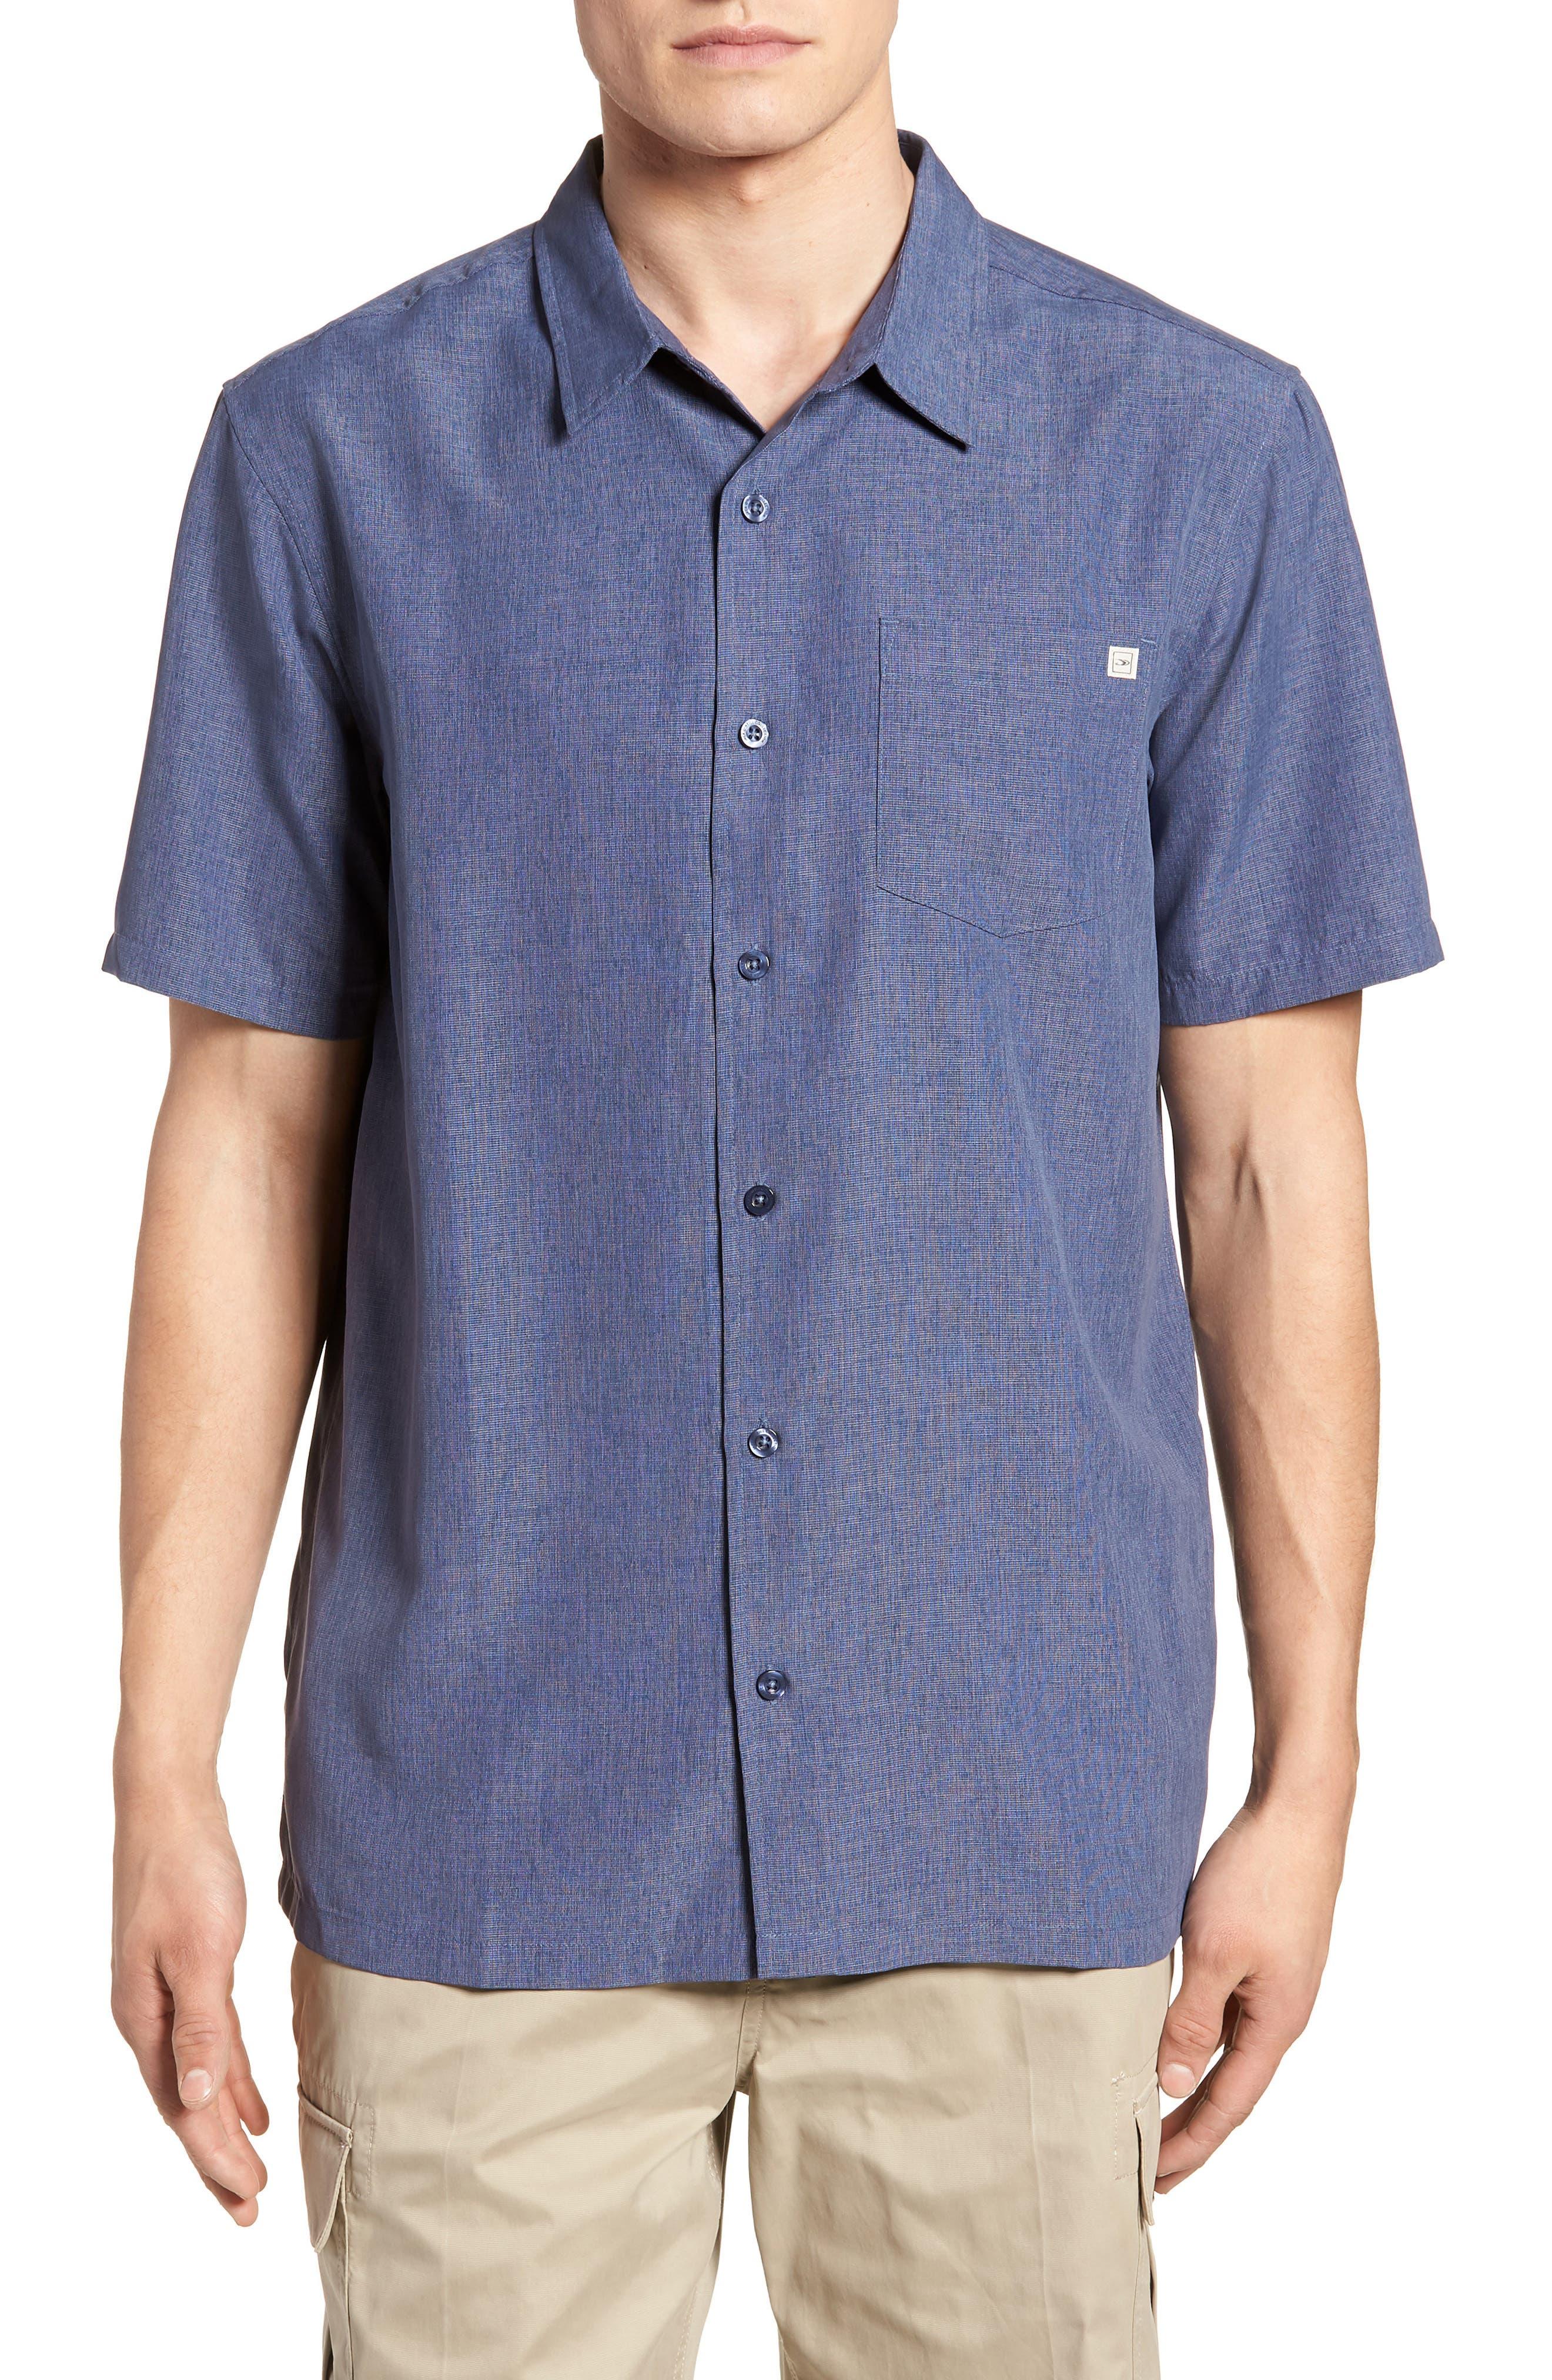 Liberty Regular Fit Short Sleeve Sport Shirt,                             Main thumbnail 1, color,                             NAVY